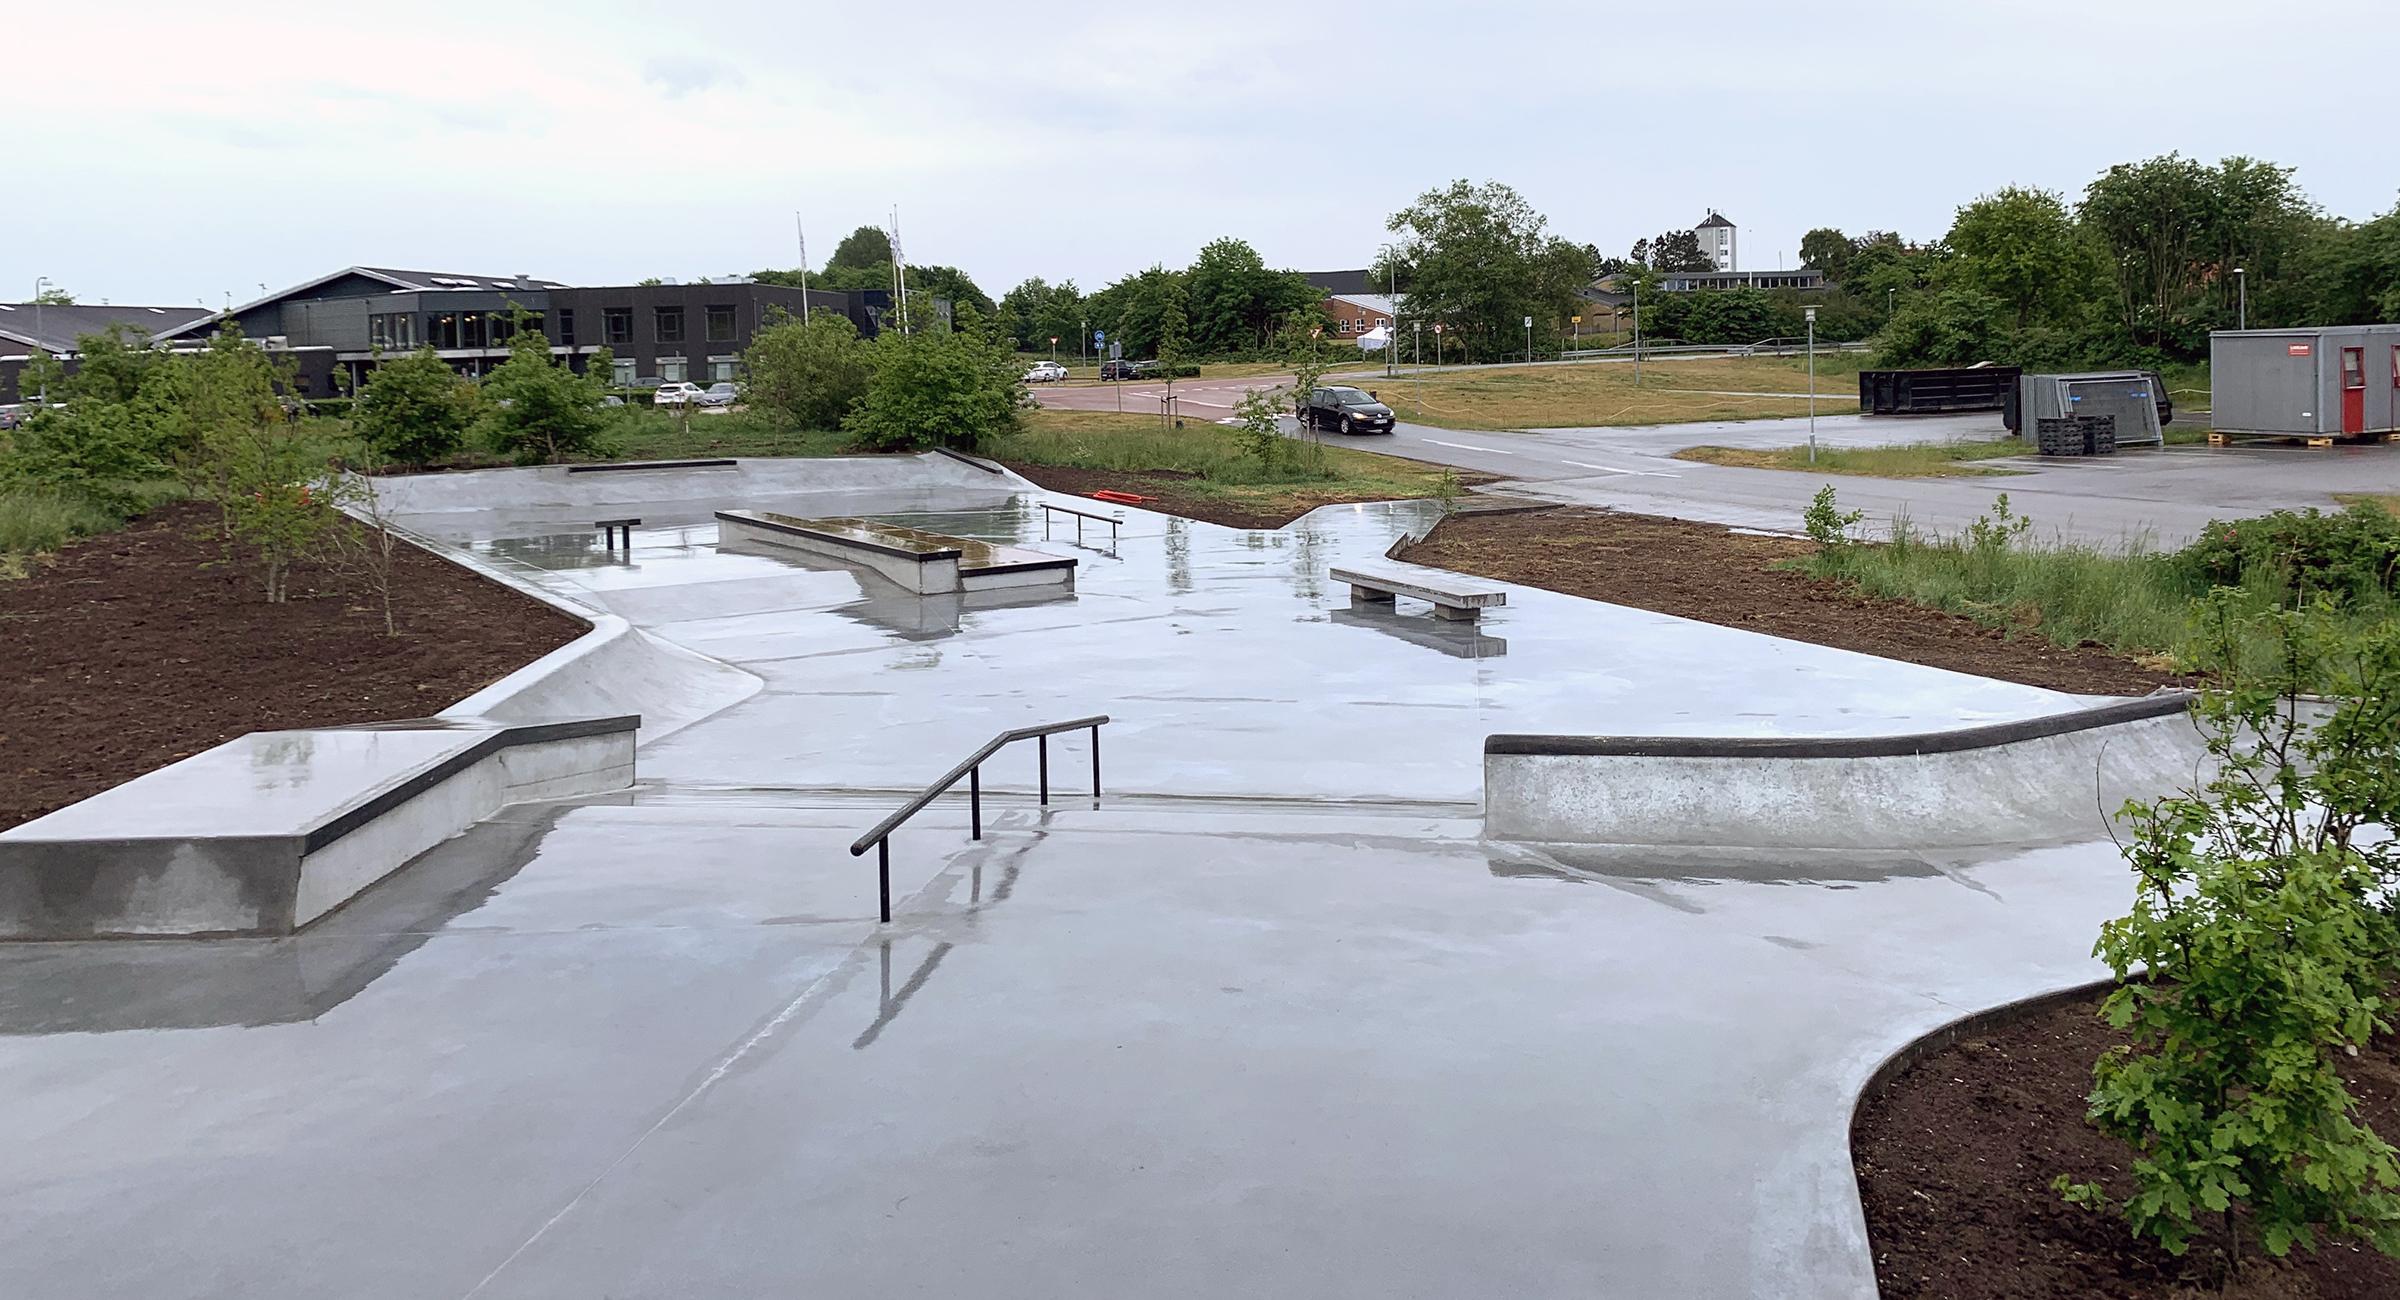 En regnvåd skatepark i beton